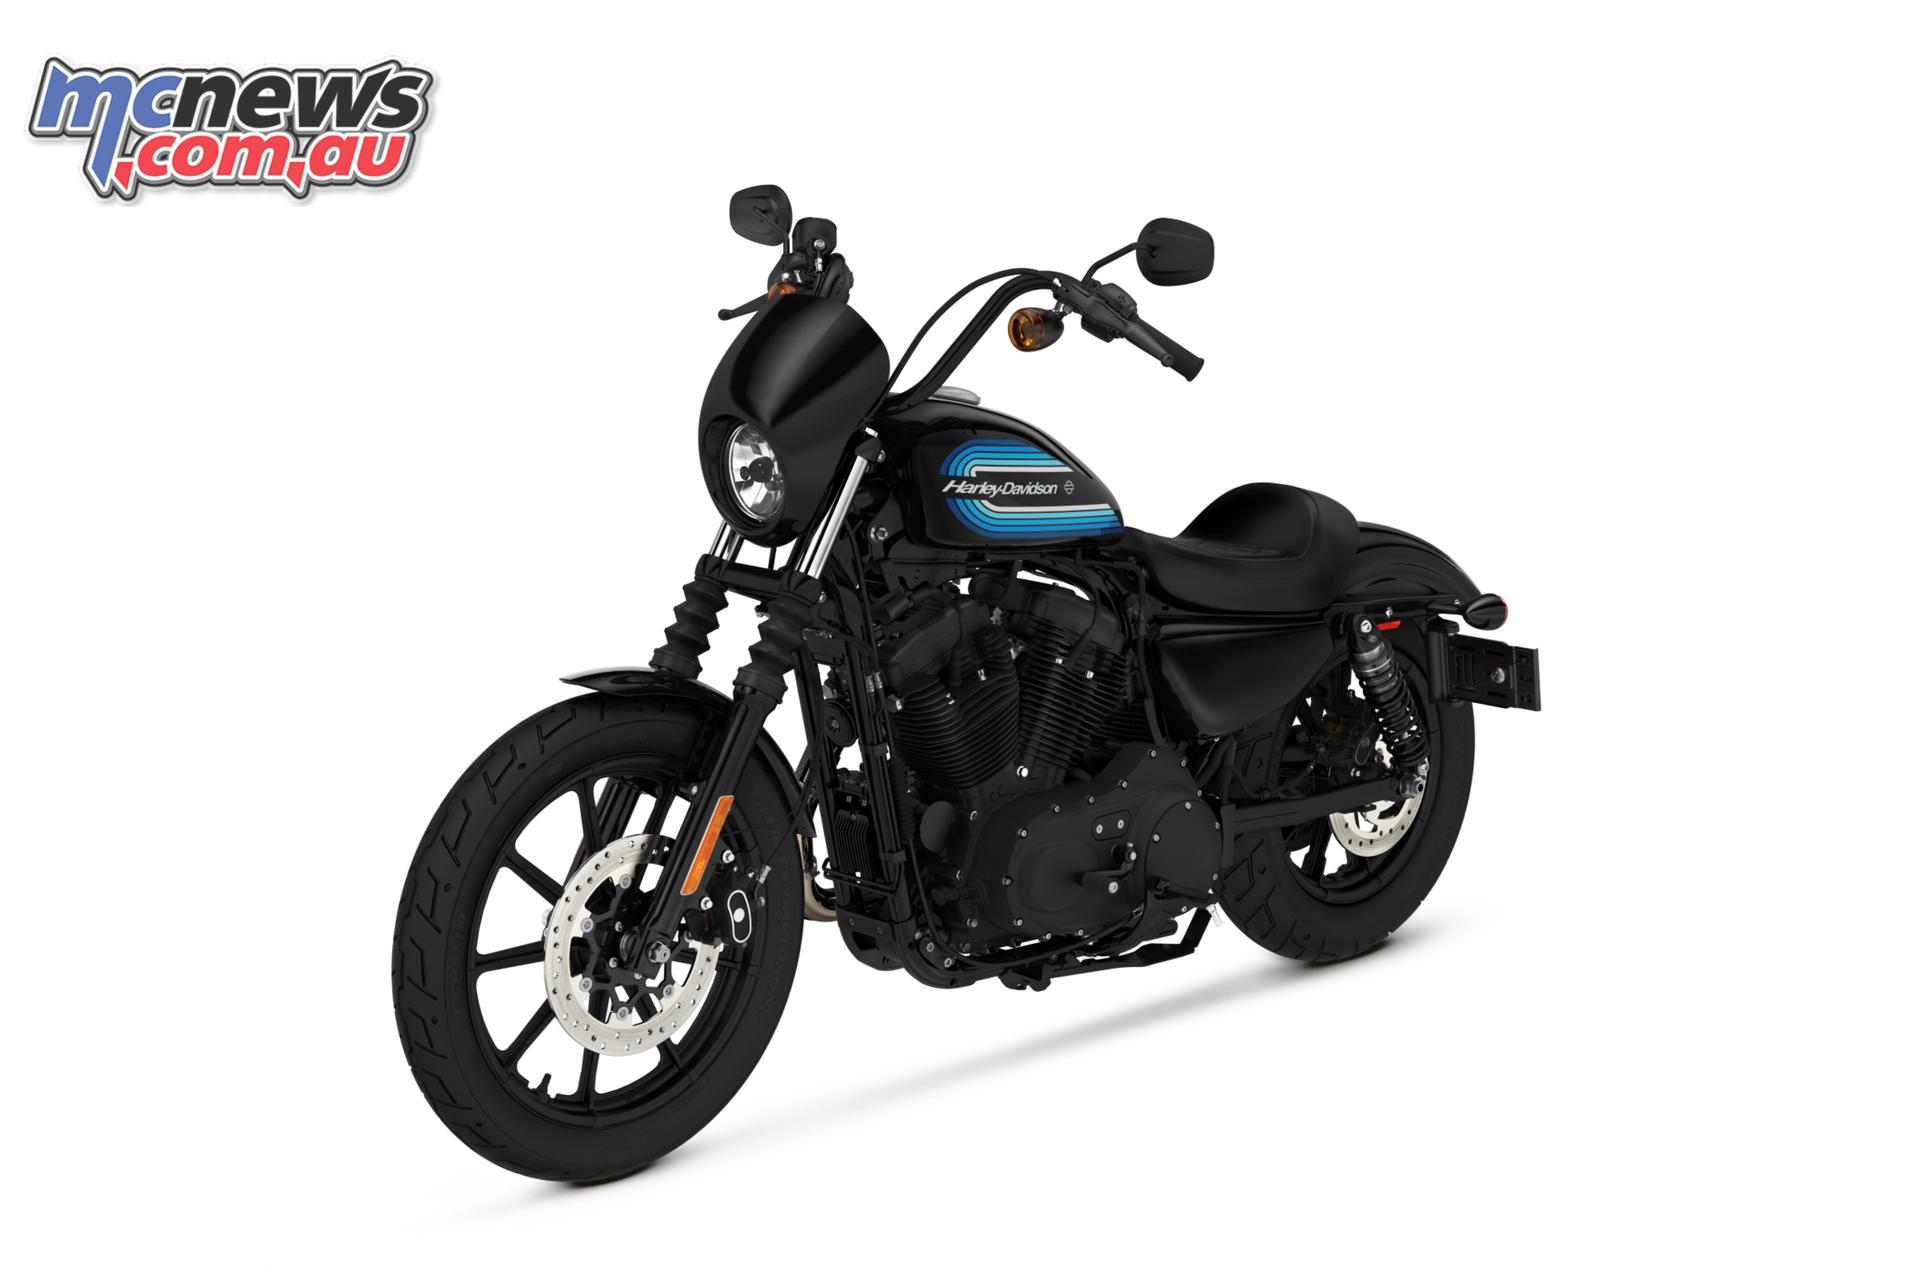 Harley Davidson Sportster  Specifications